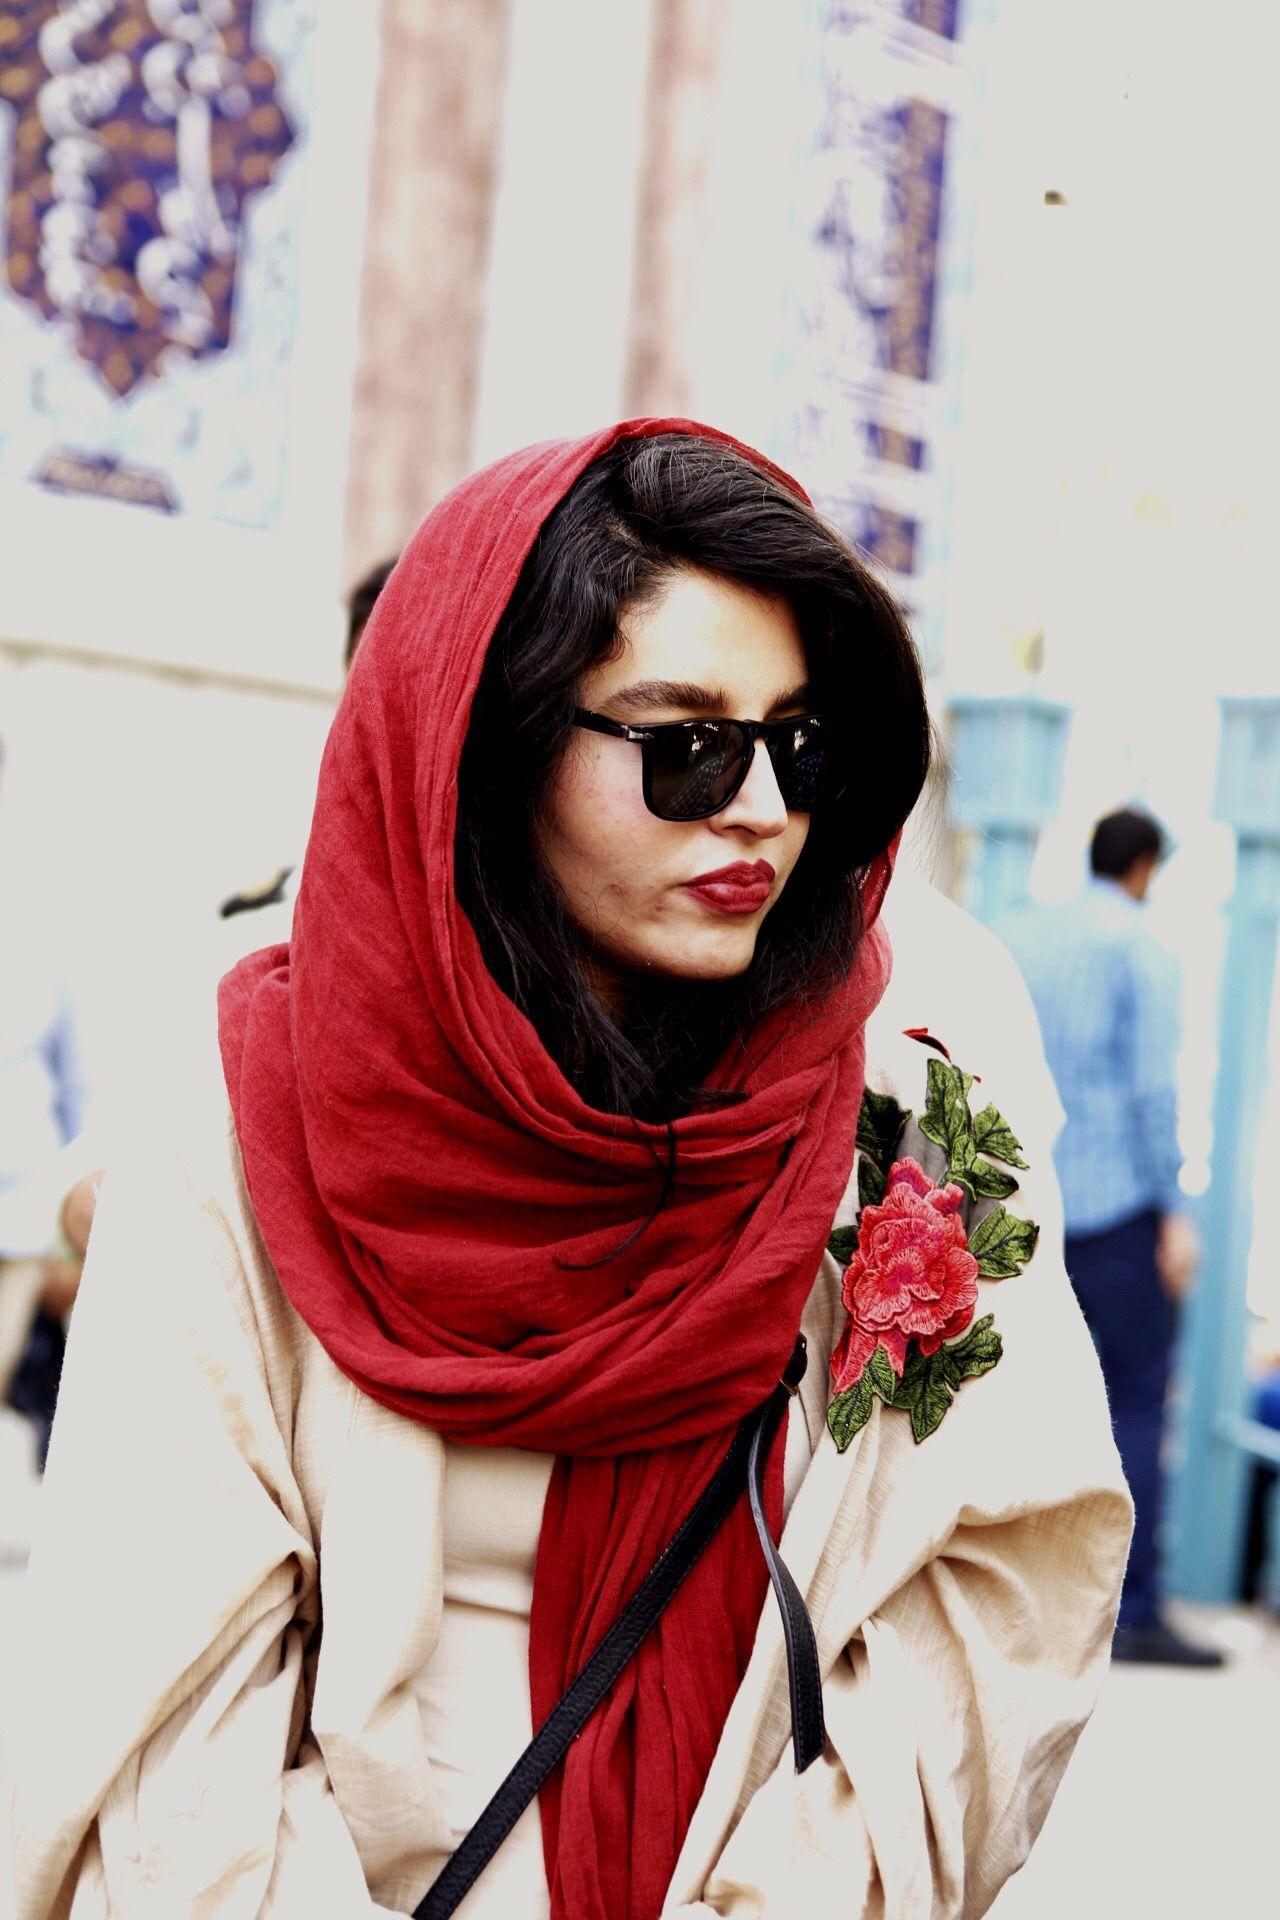 Live For The Story The Photojournalist - 2017 EyeEm Awards BYOPaper! The Street Photographer - 2017 EyeEm Awards Portrait Iranian Girl Iran Election 2017 Iranian People Tehran, Iran The Portraitist - 2017 EyeEm Awards The Photojournalist - 2017 EyeEm Awards